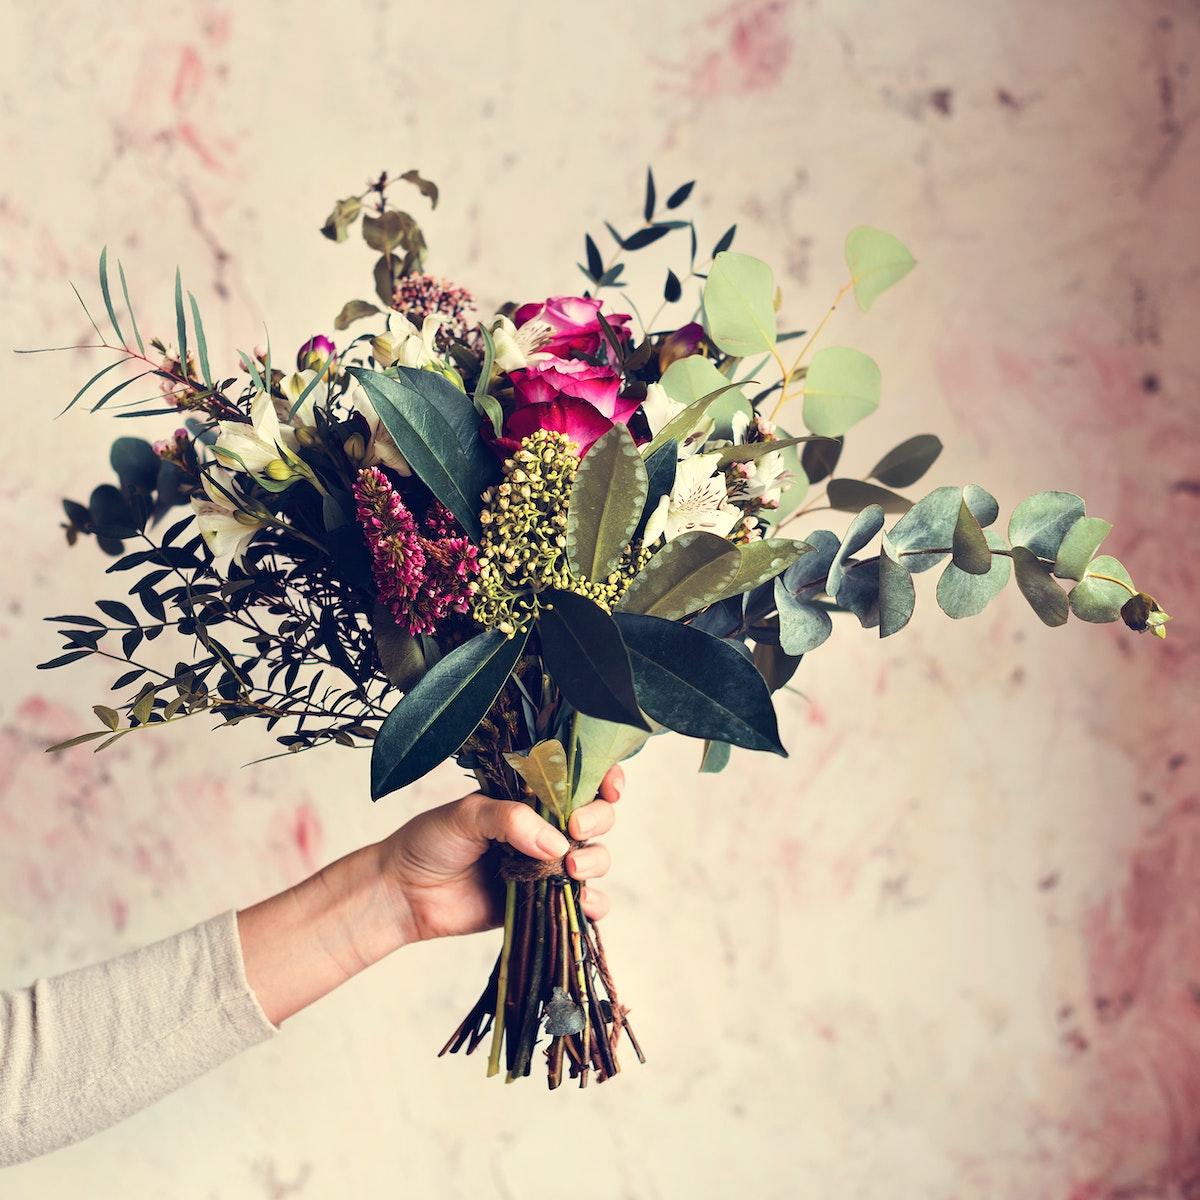 Woman Hands Holding Beautiful Flowers Bouquet